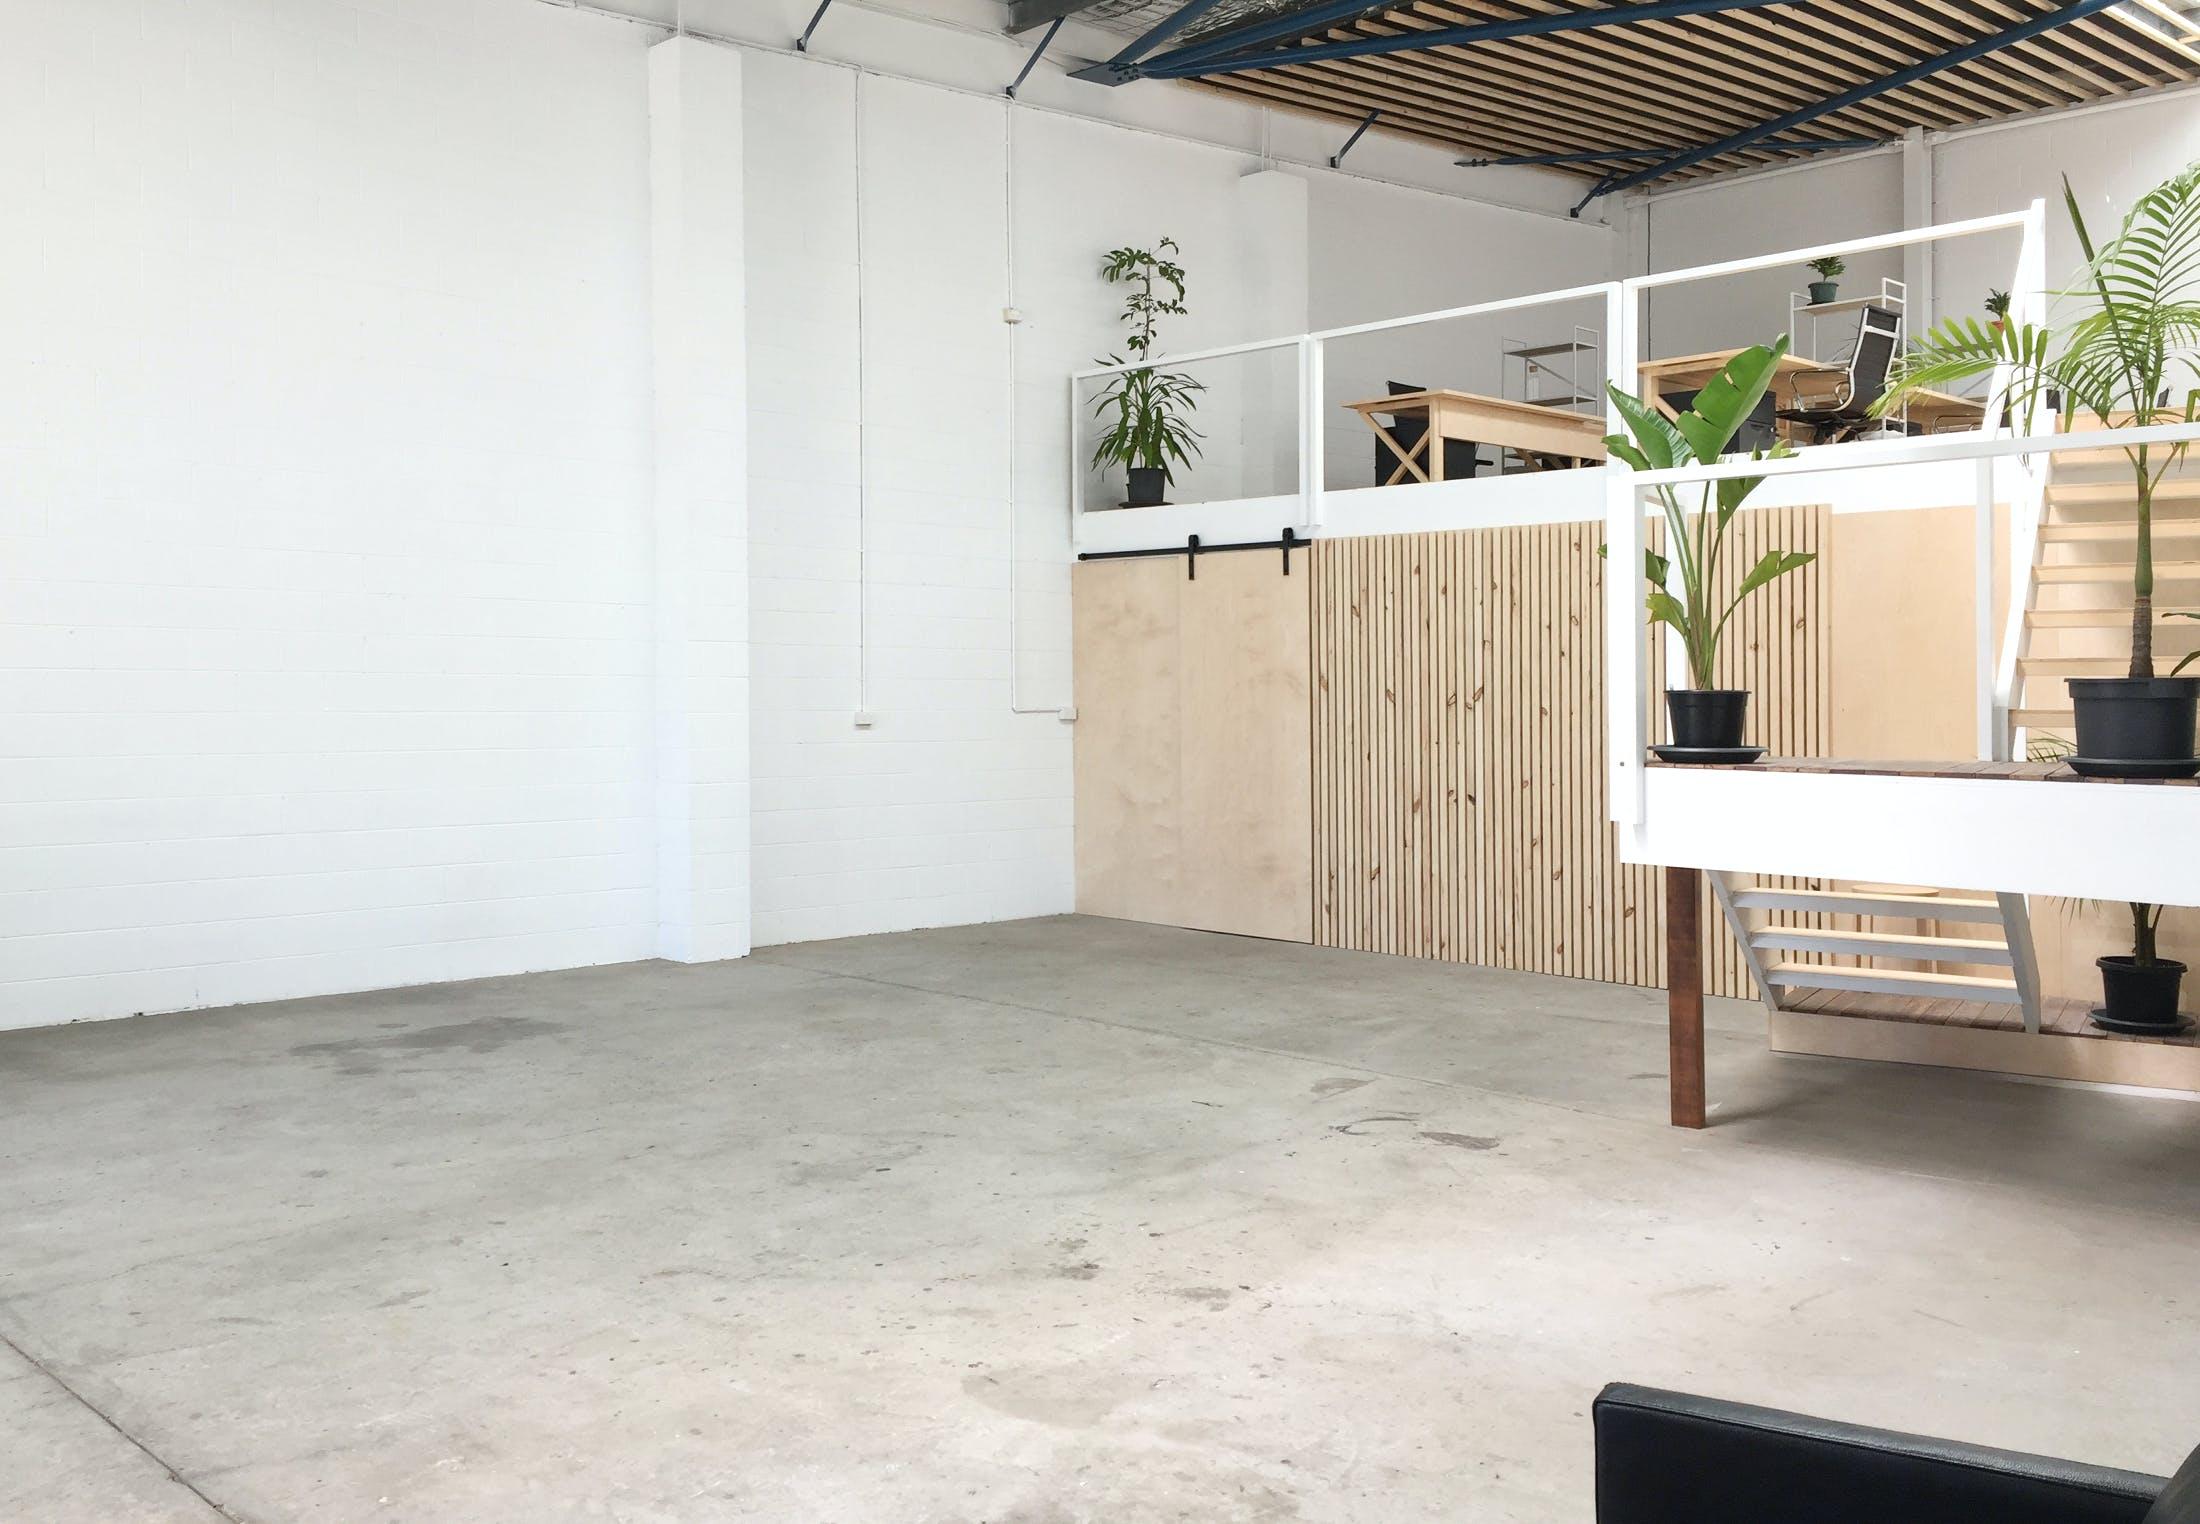 KGDM Ground Floor, multi-use area at KGDM, image 1